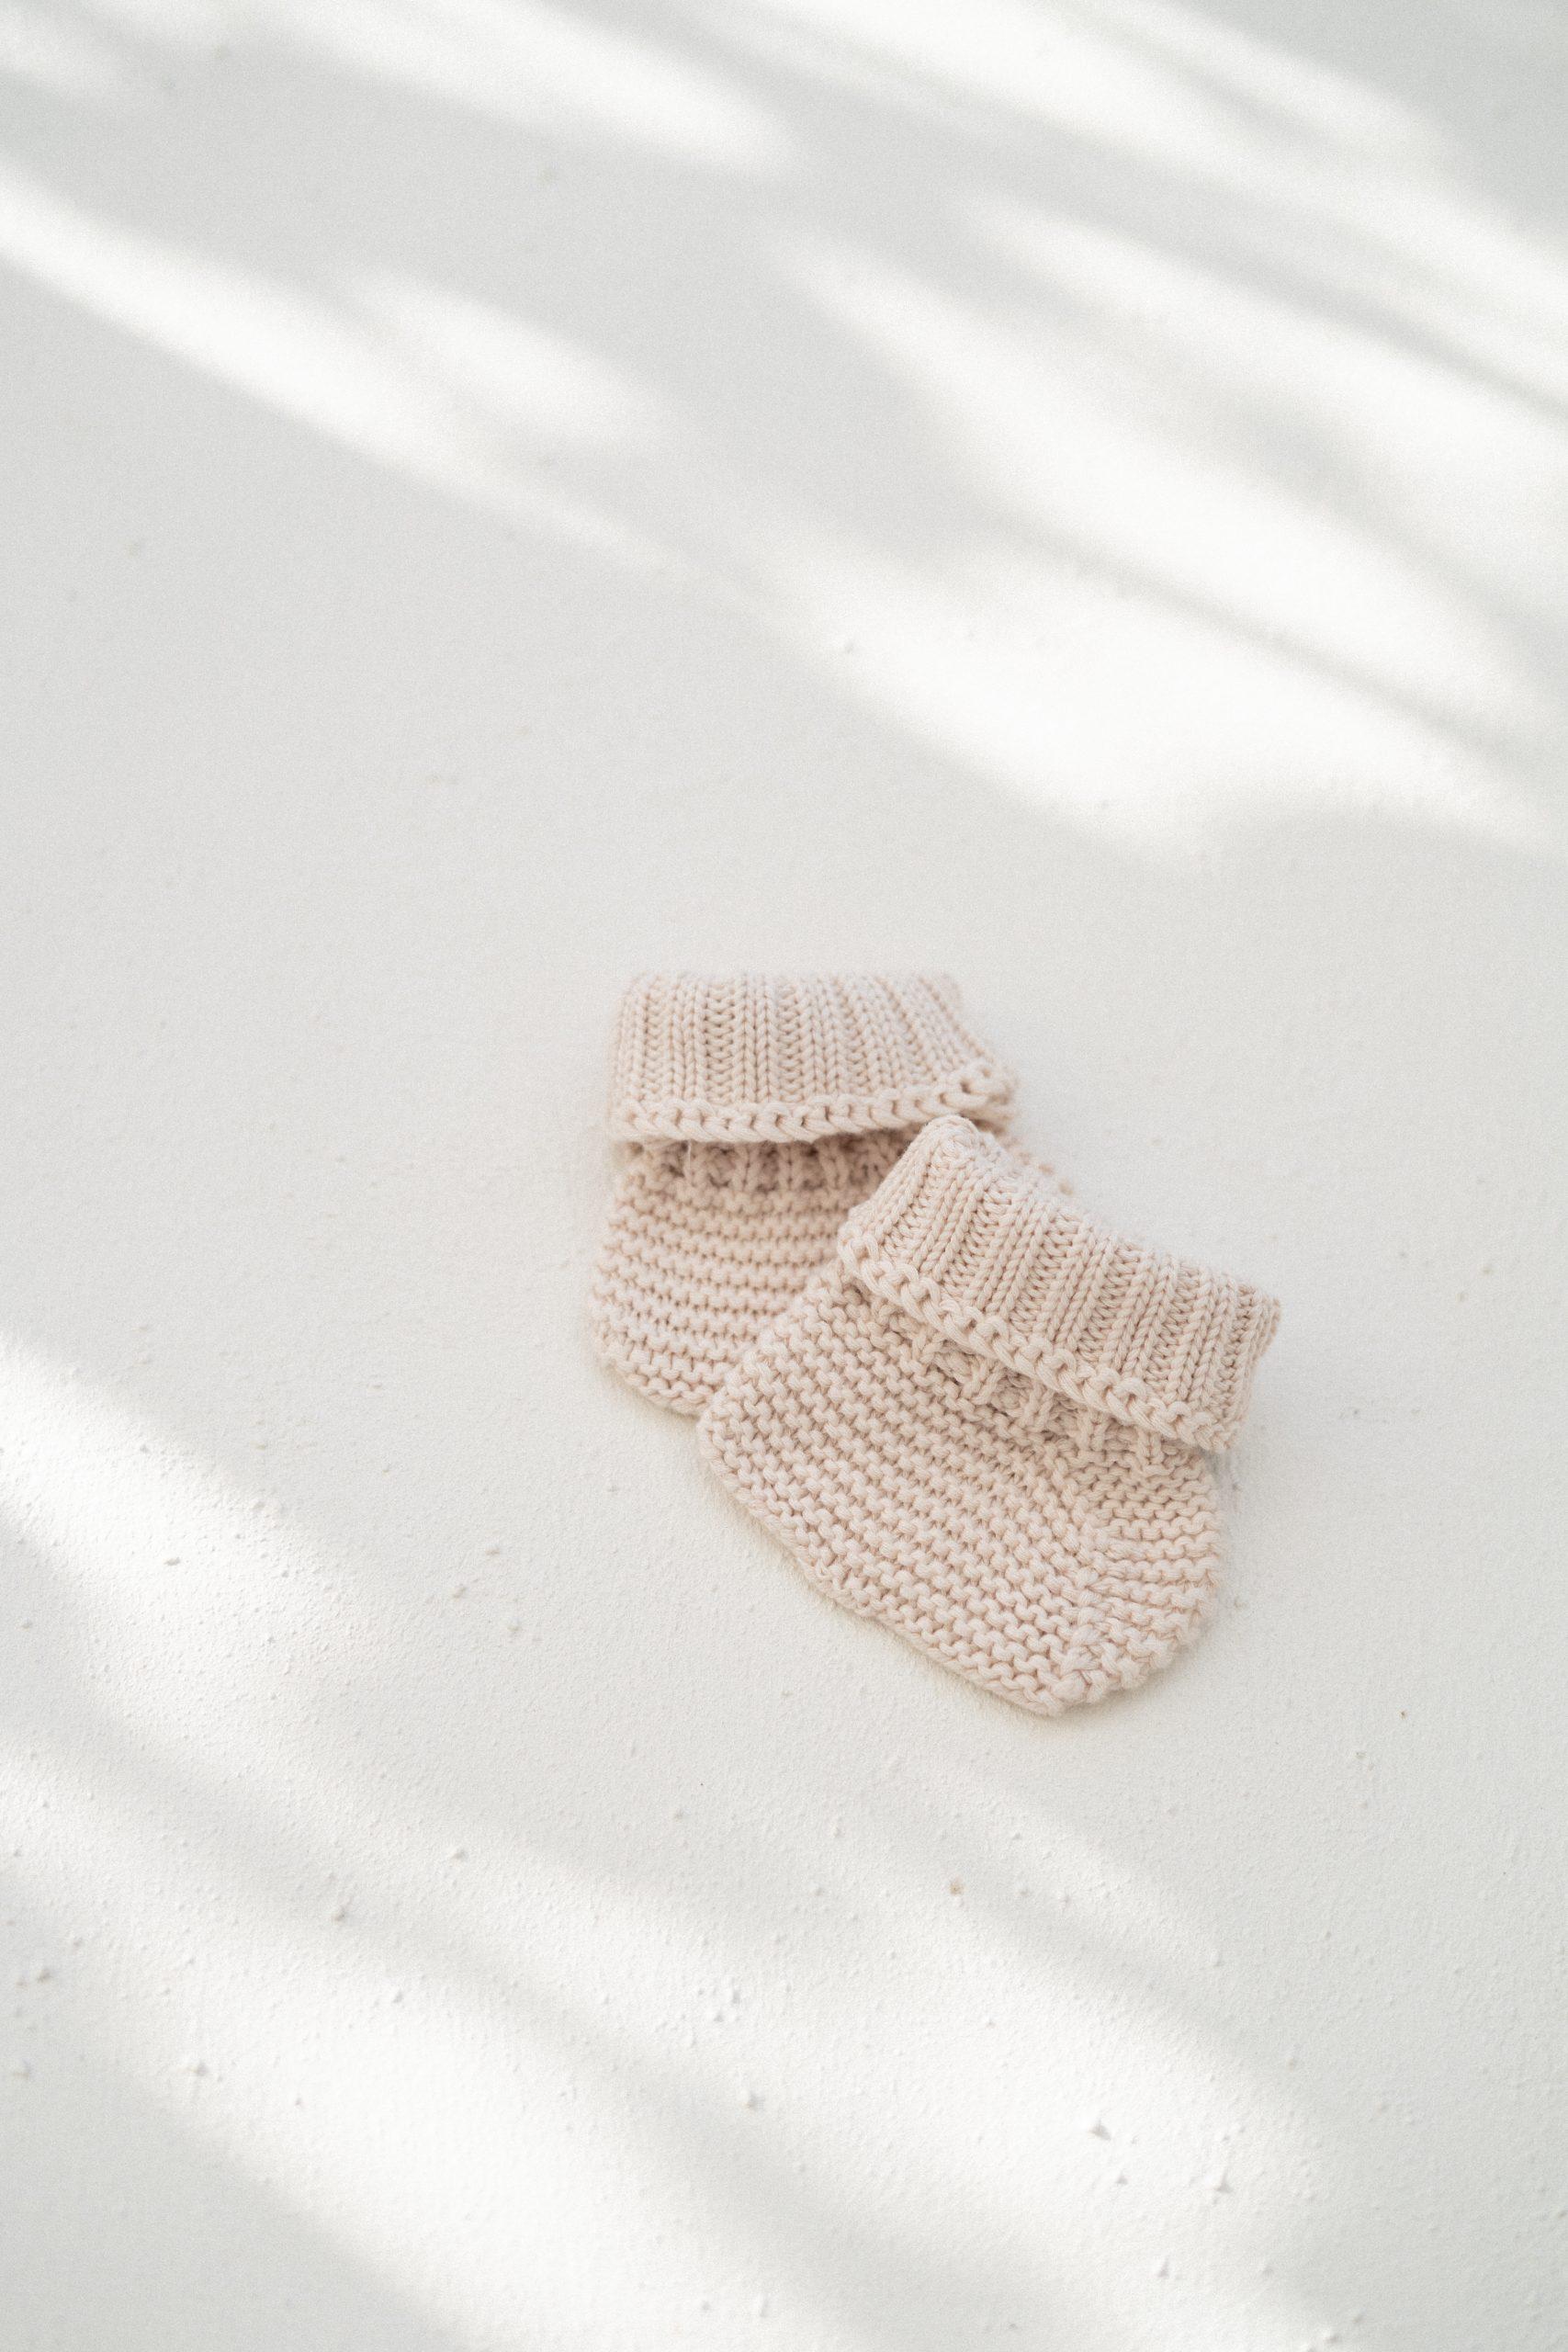 Illoura Alba Bonnet (mushroom)